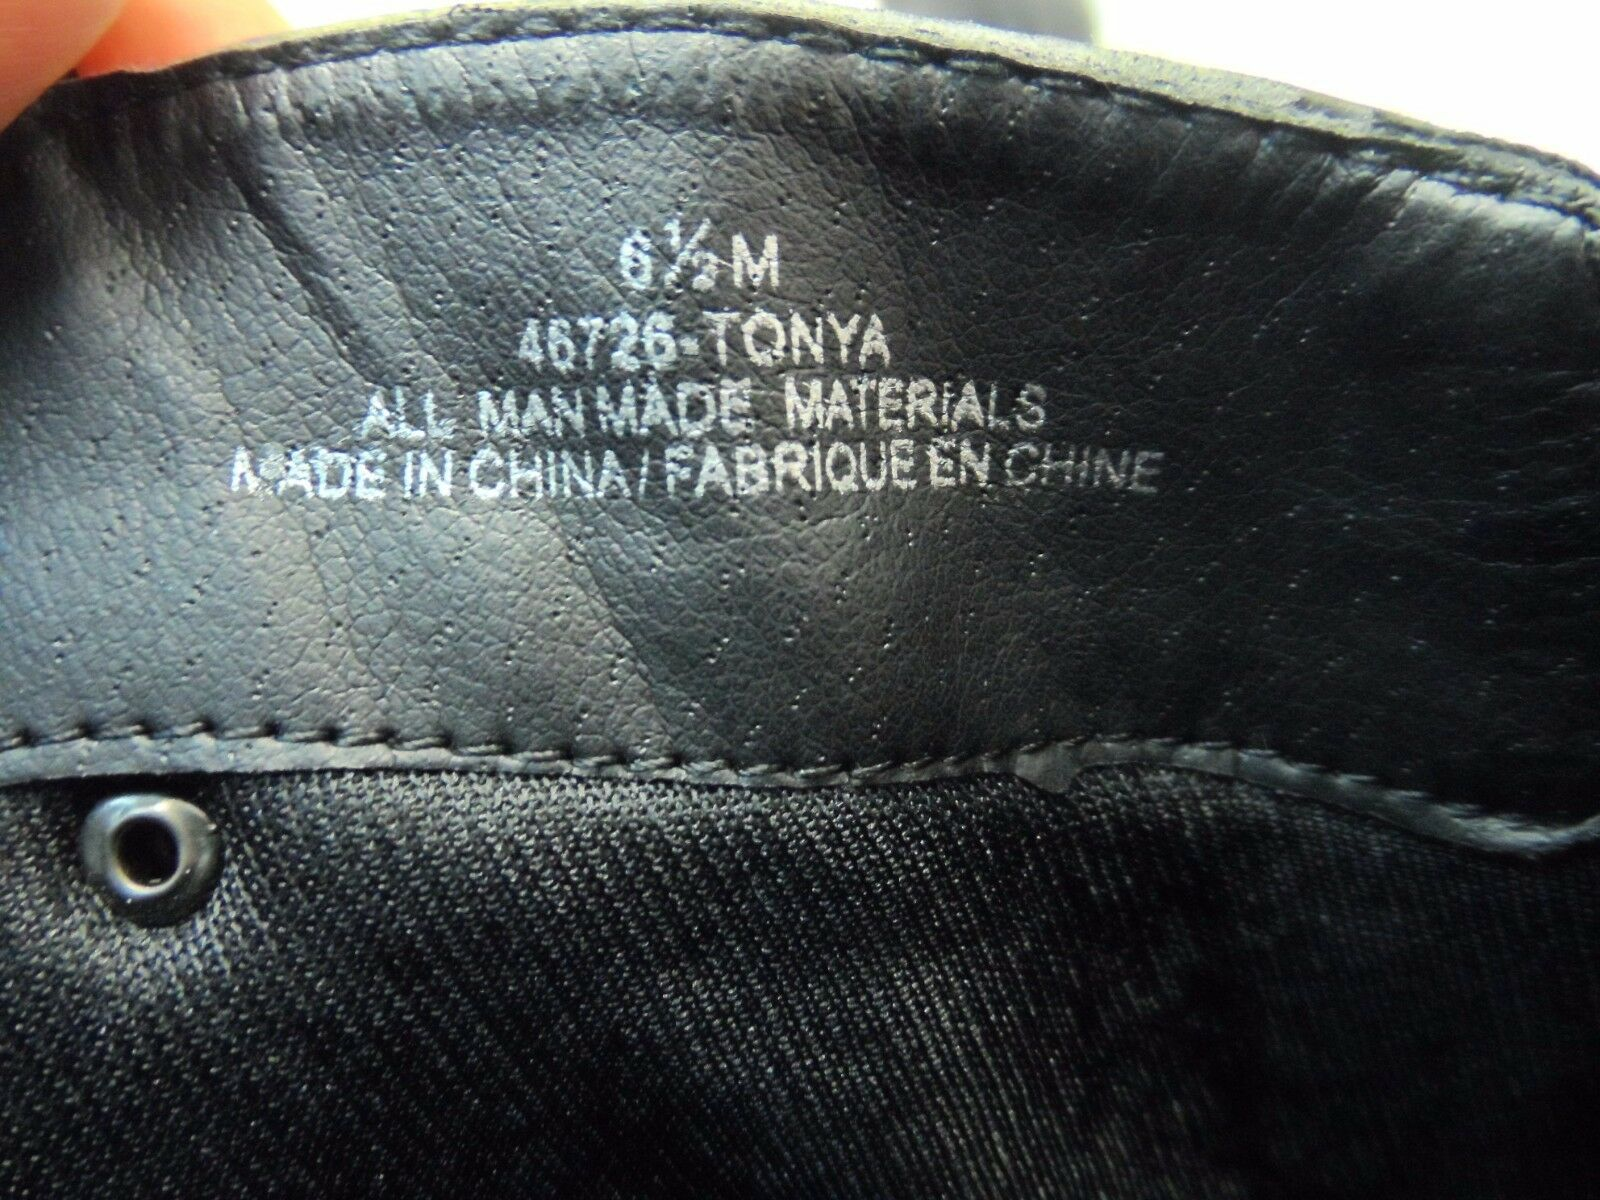 Maurcies Round Women's Tonya Synthetic Round Maurcies Toe Boot Black Size 6.5M 37186c